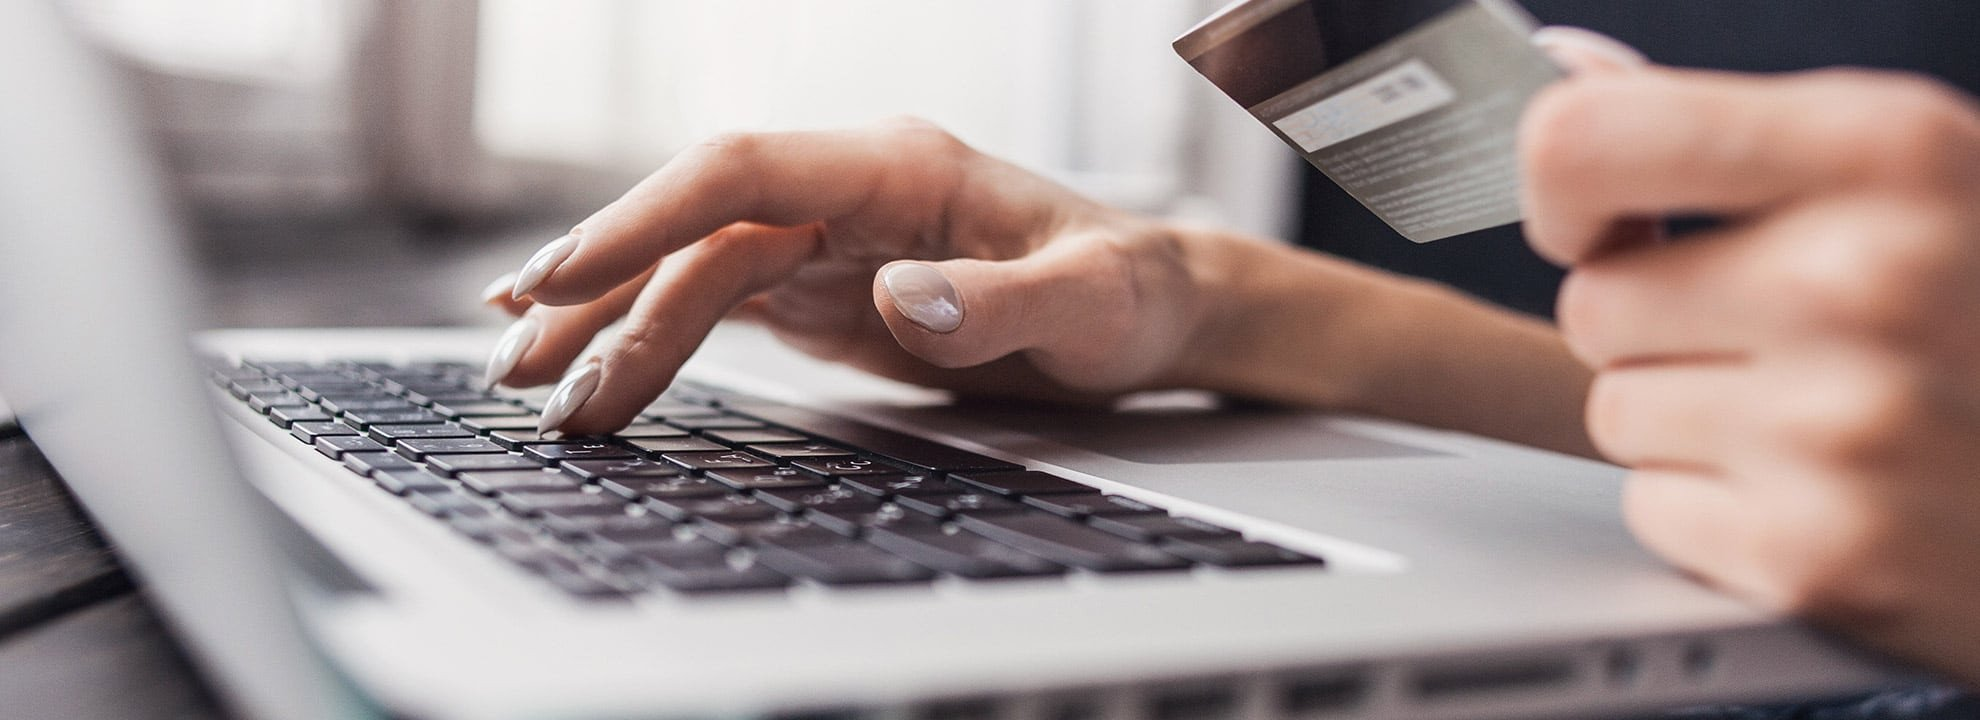 E-Commerce & Online-Shops